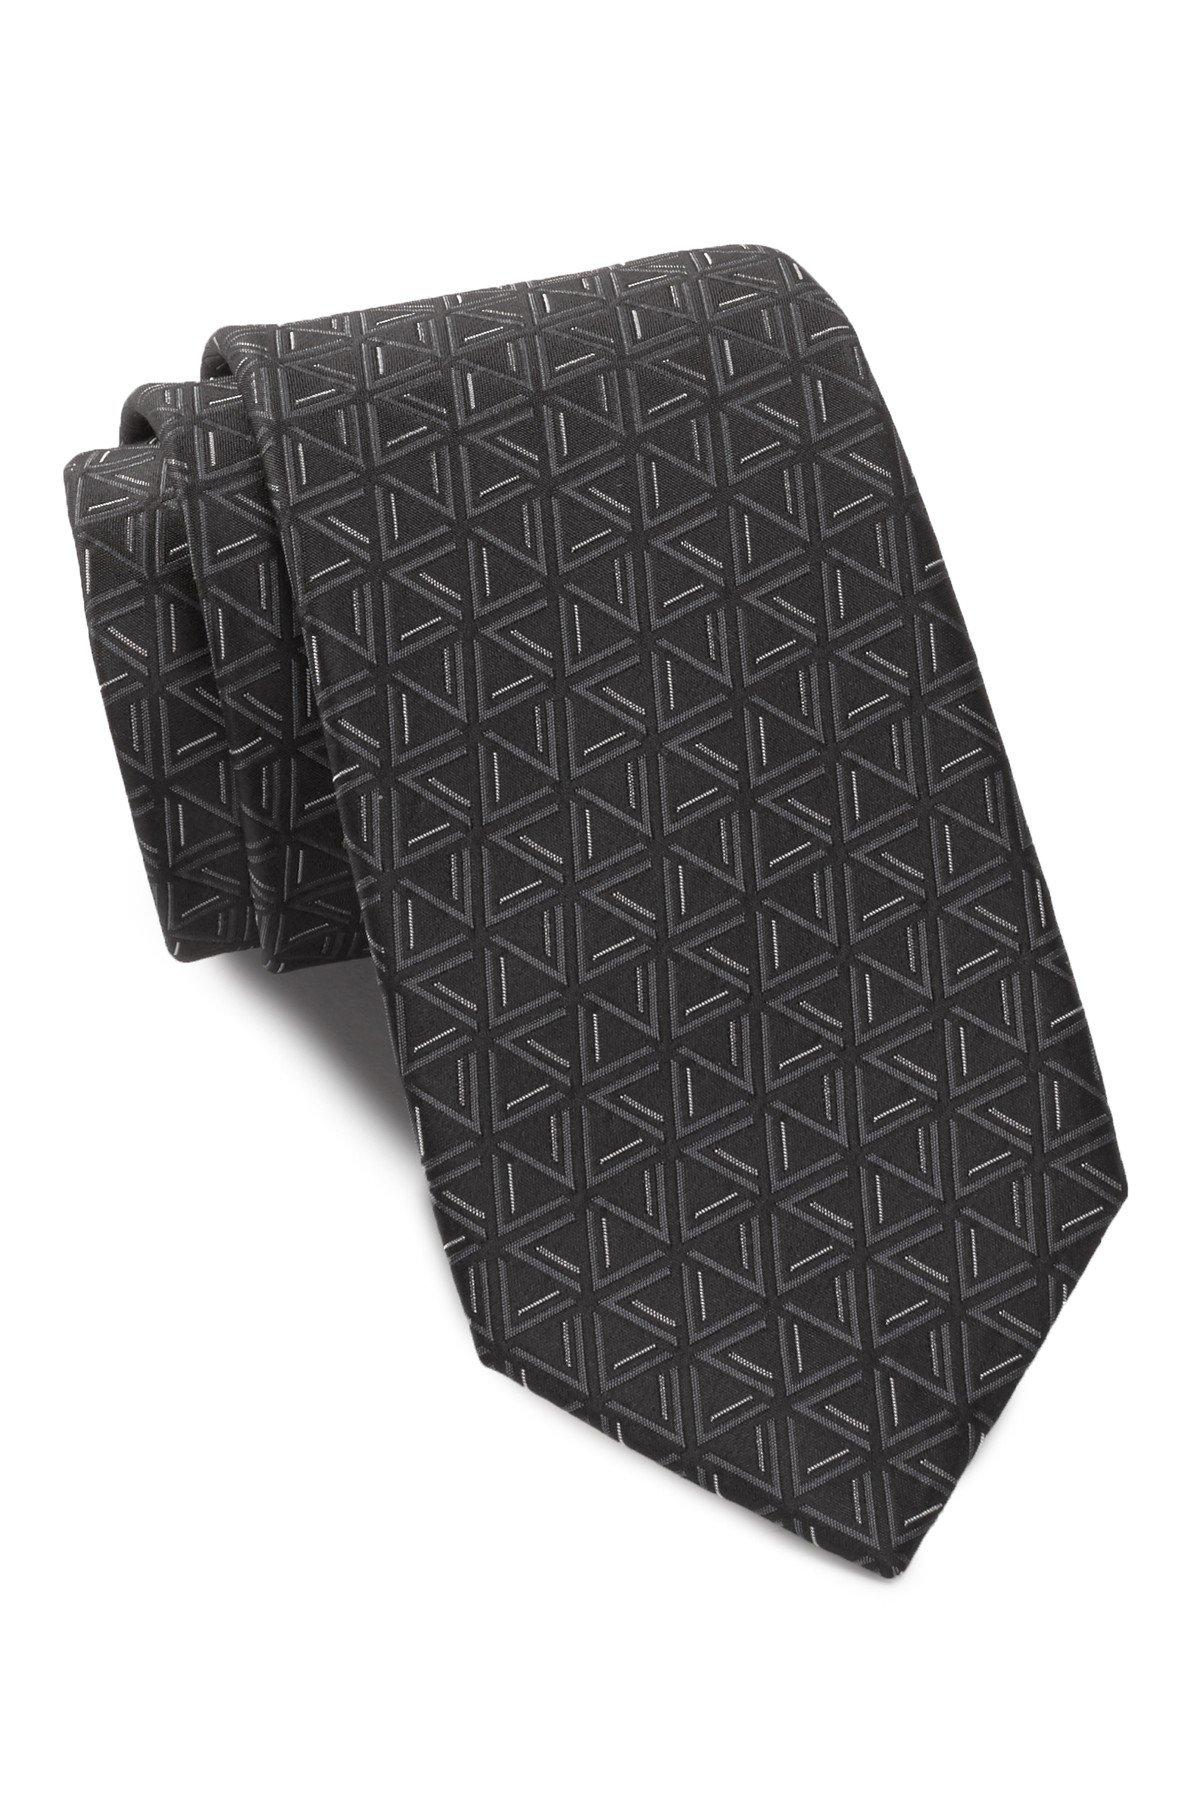 Ben Sherman Men's Triangle Print Silk Tie (Black)